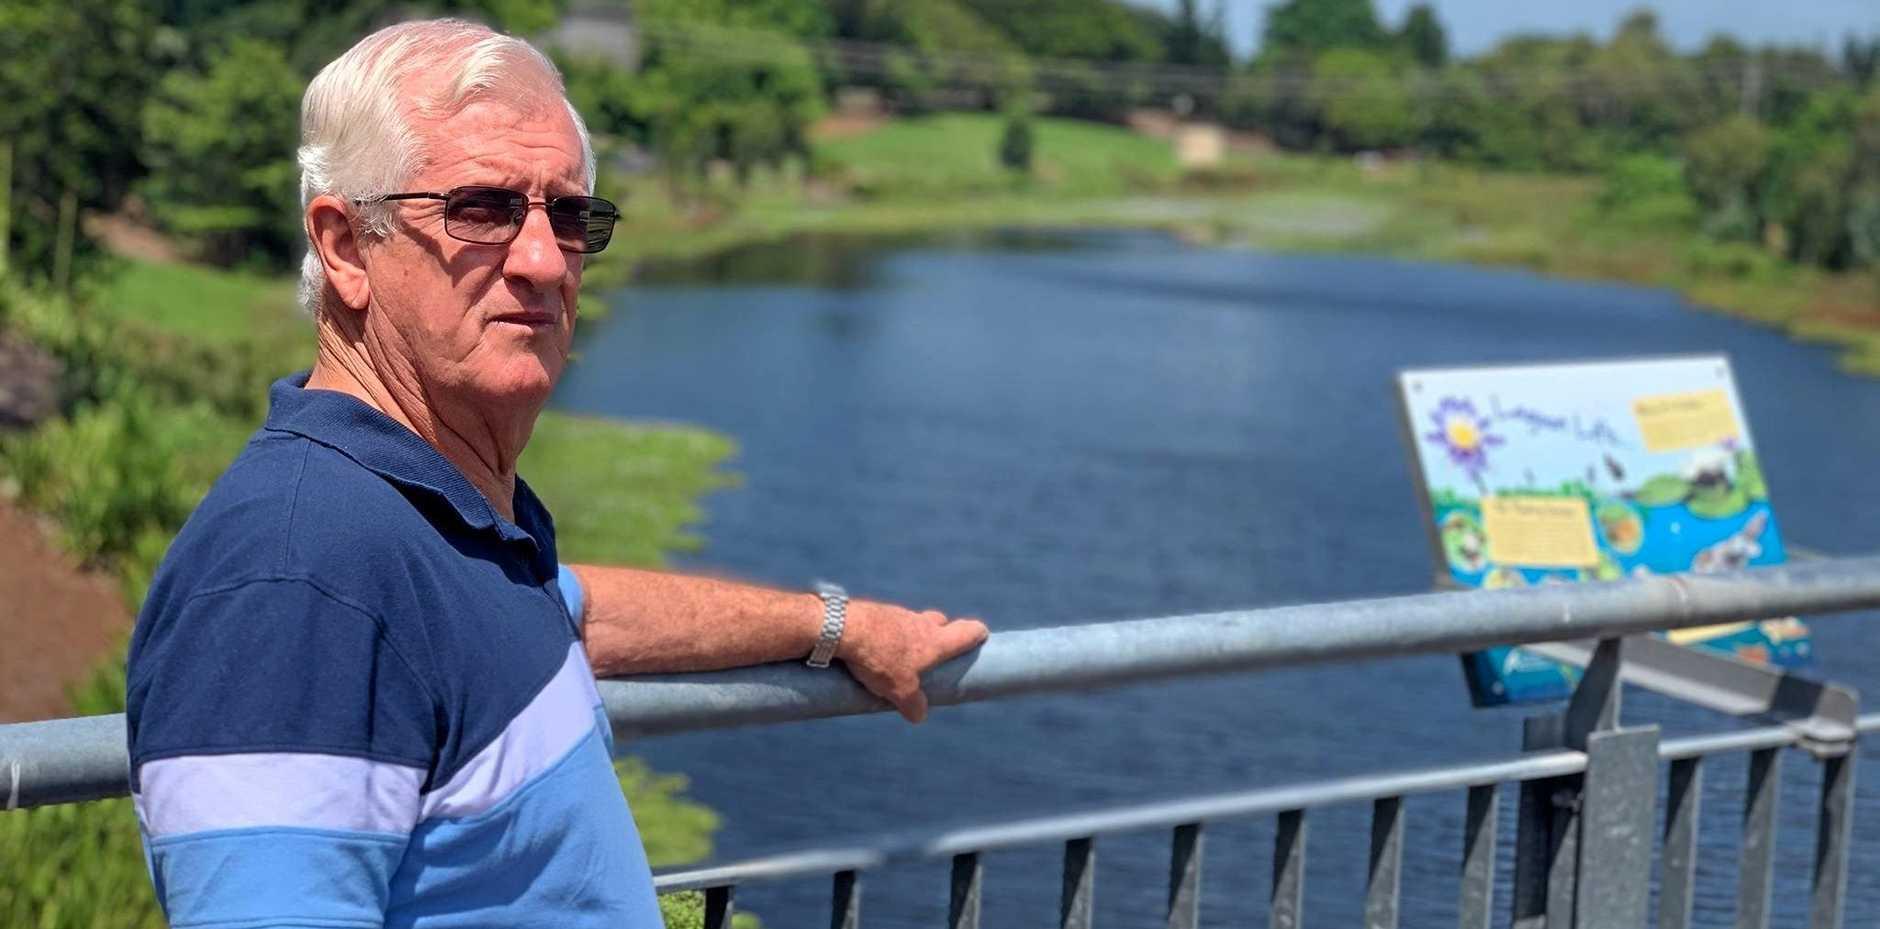 OVERGROWN: Mackay man Graeme Ransley is concerned about the pest weeds growing in the Mackay Botanic Gardens waterways.